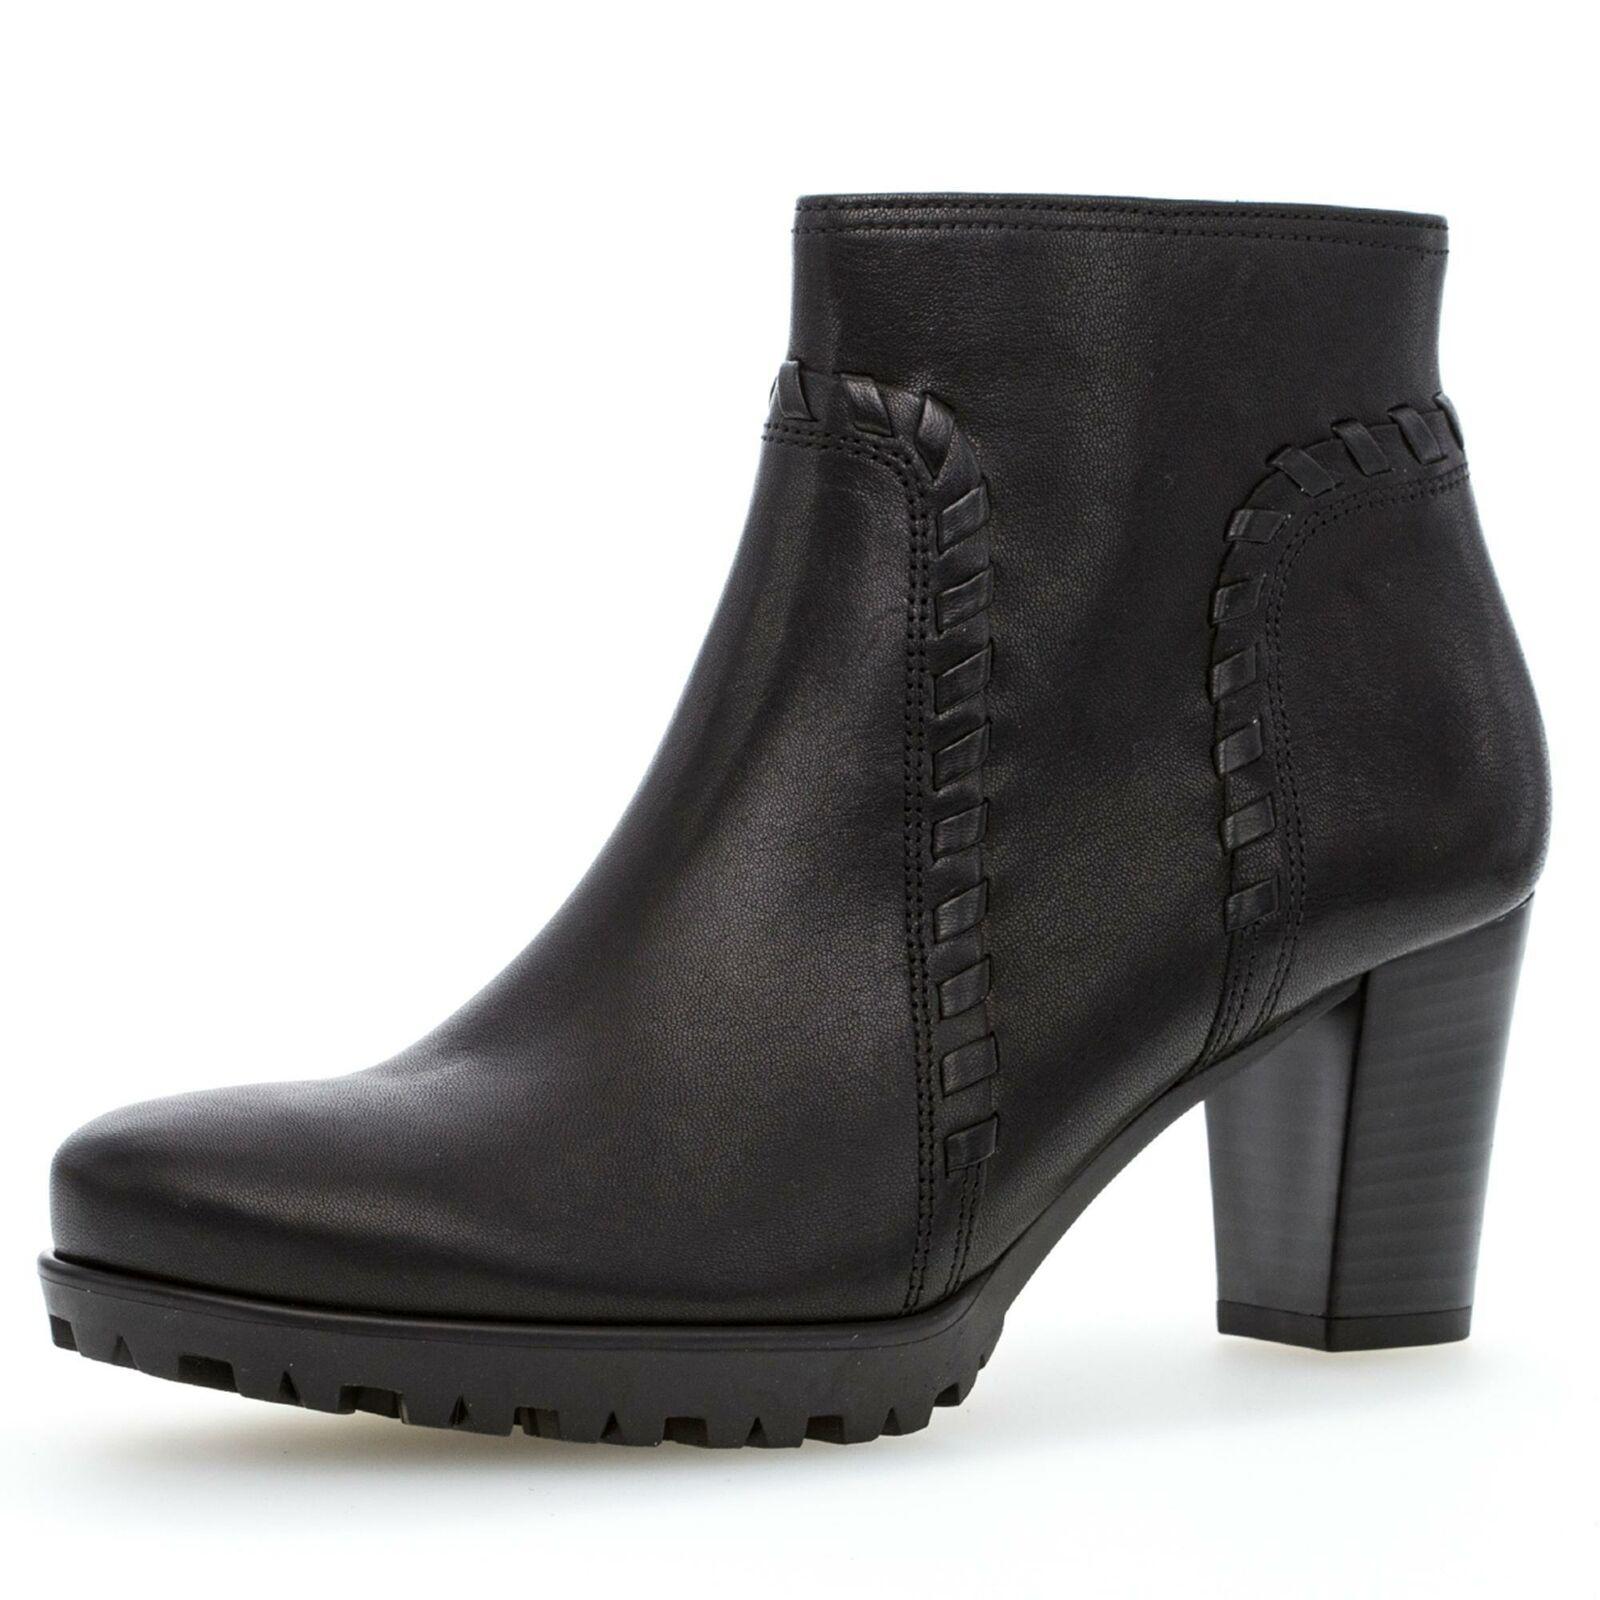 Gabor Comfort Damen klassische Stiefelette Komfortstiefelette Schuhe schwarz